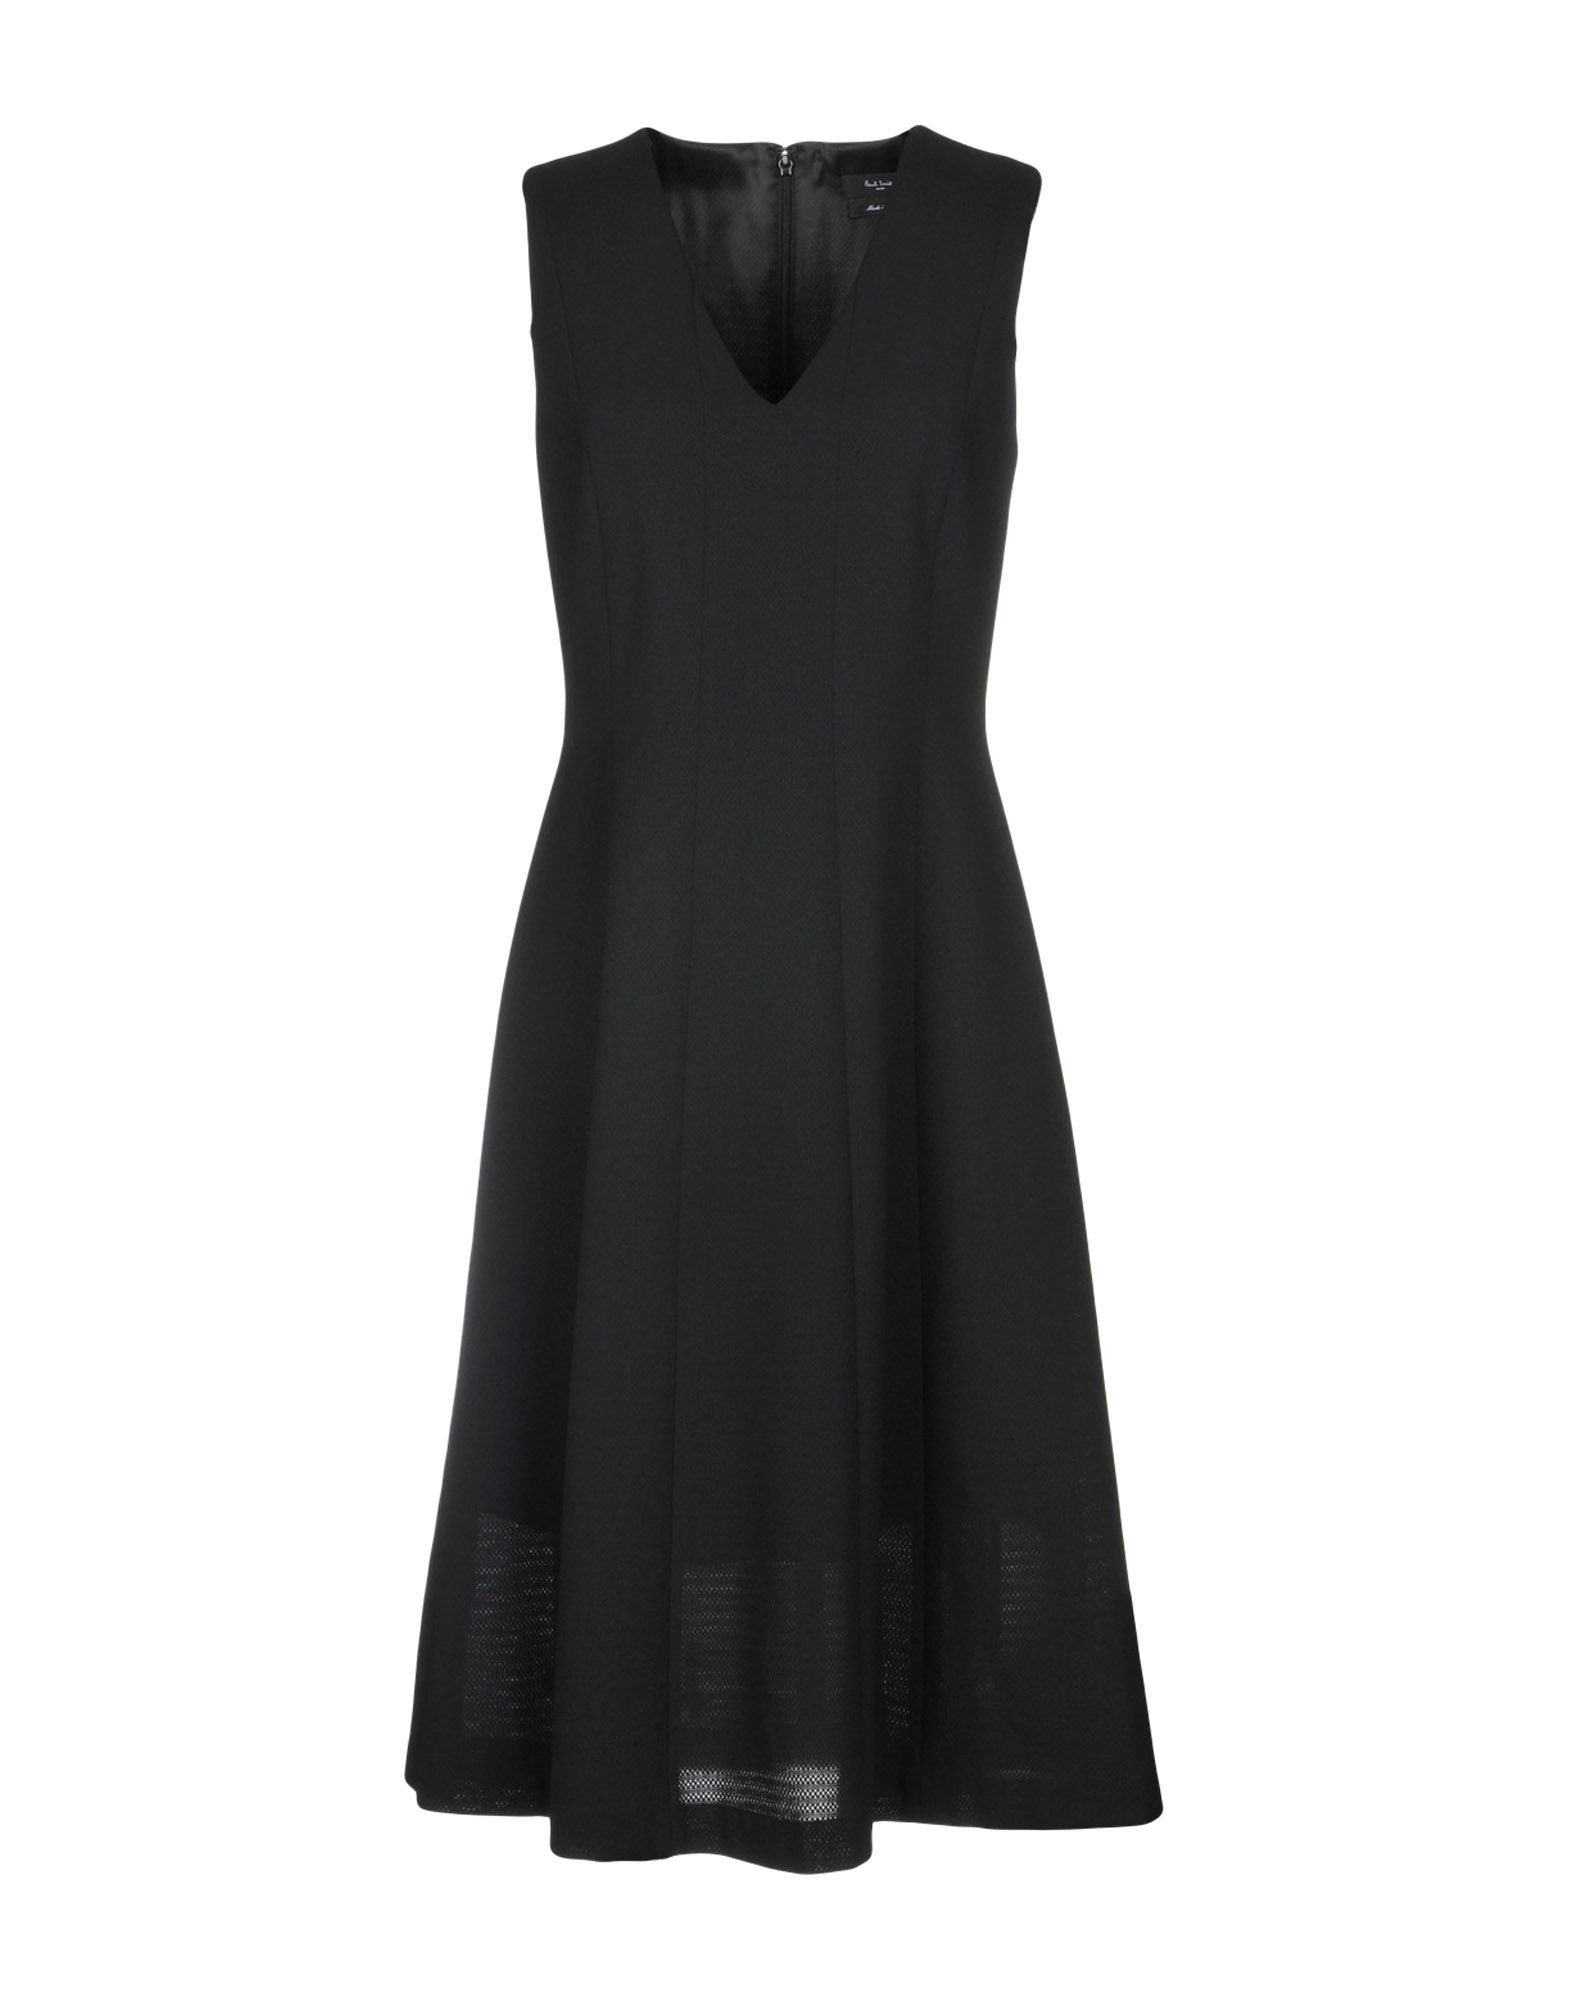 PAUL SMITH BLACK LABEL Платье до колена paul smith ремень